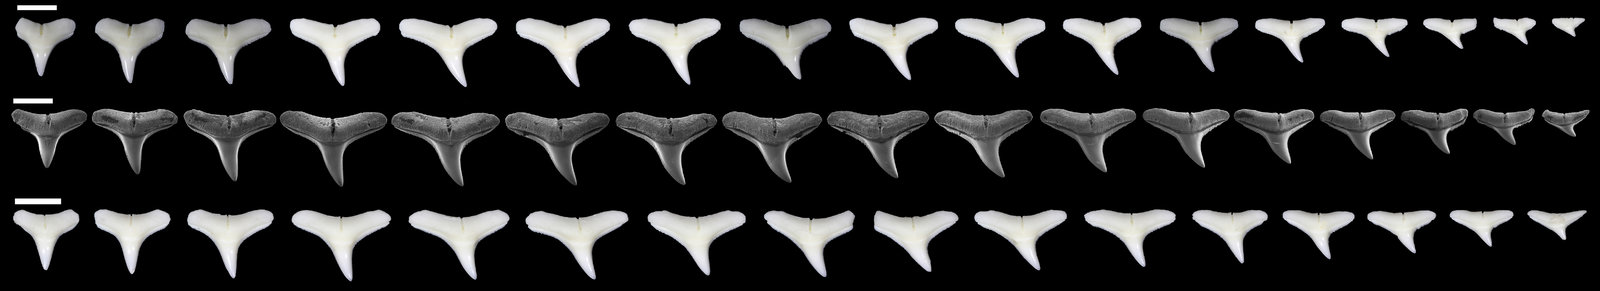 Carcharhinus brevipinna.jpg